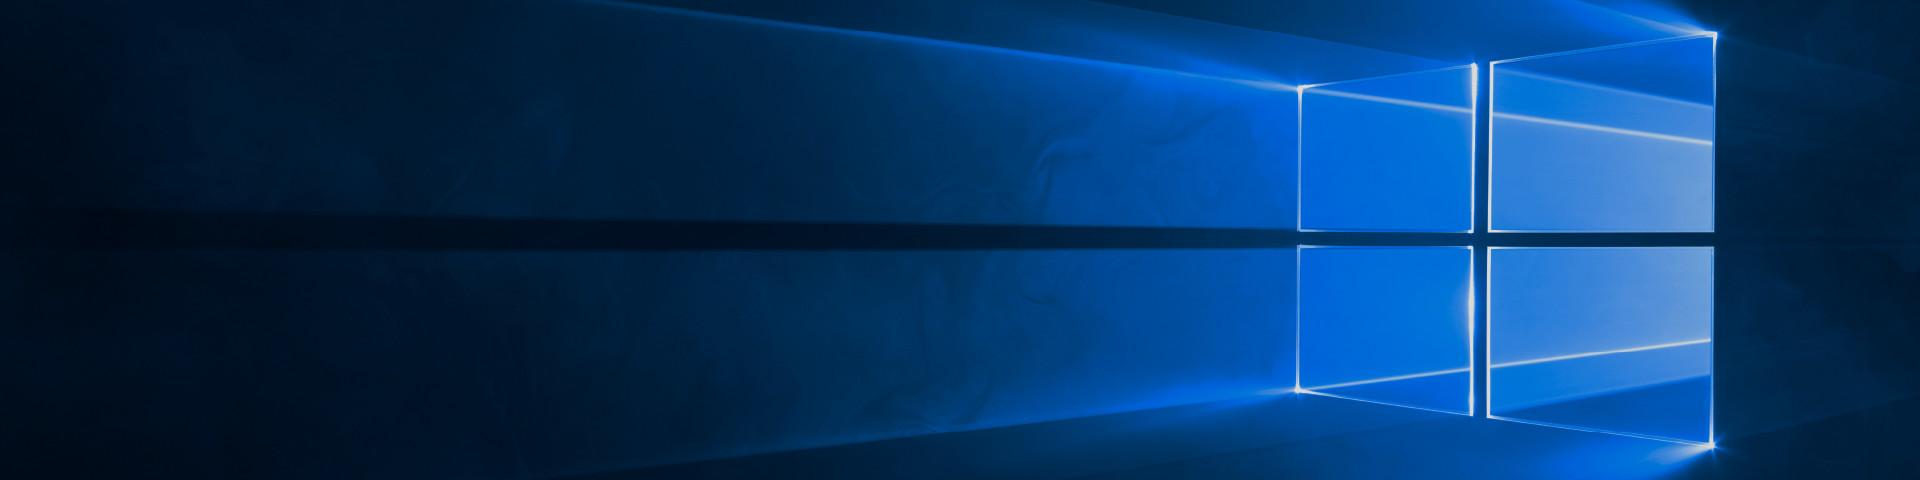 komputer, uaktualnienie do systemu Windows10